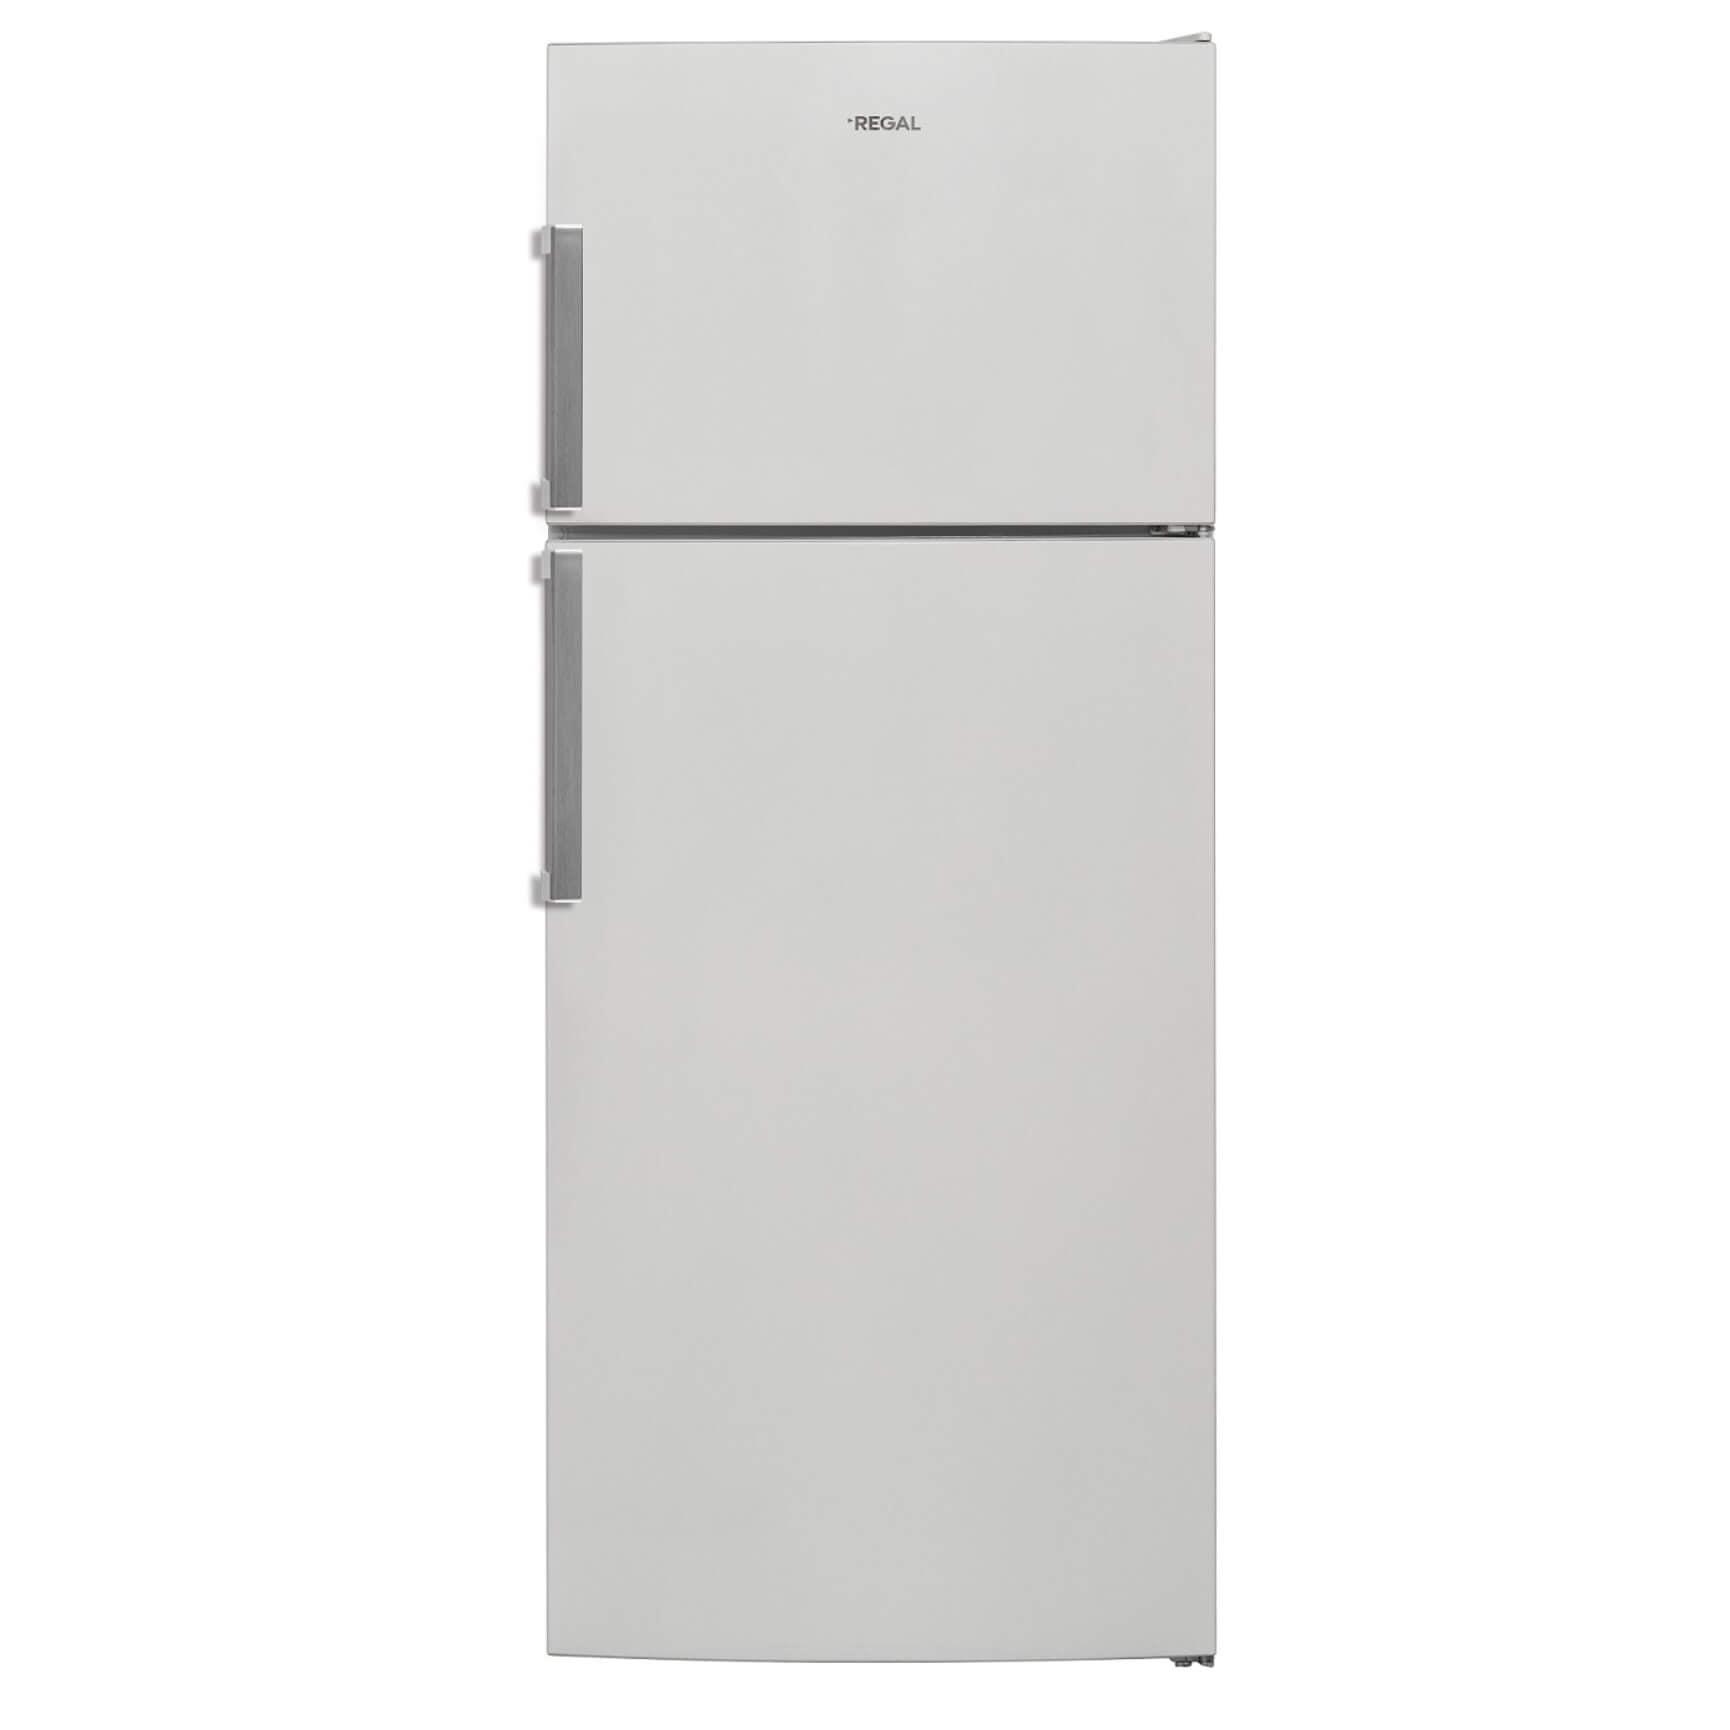 Regal NF 6021 buzdolabi